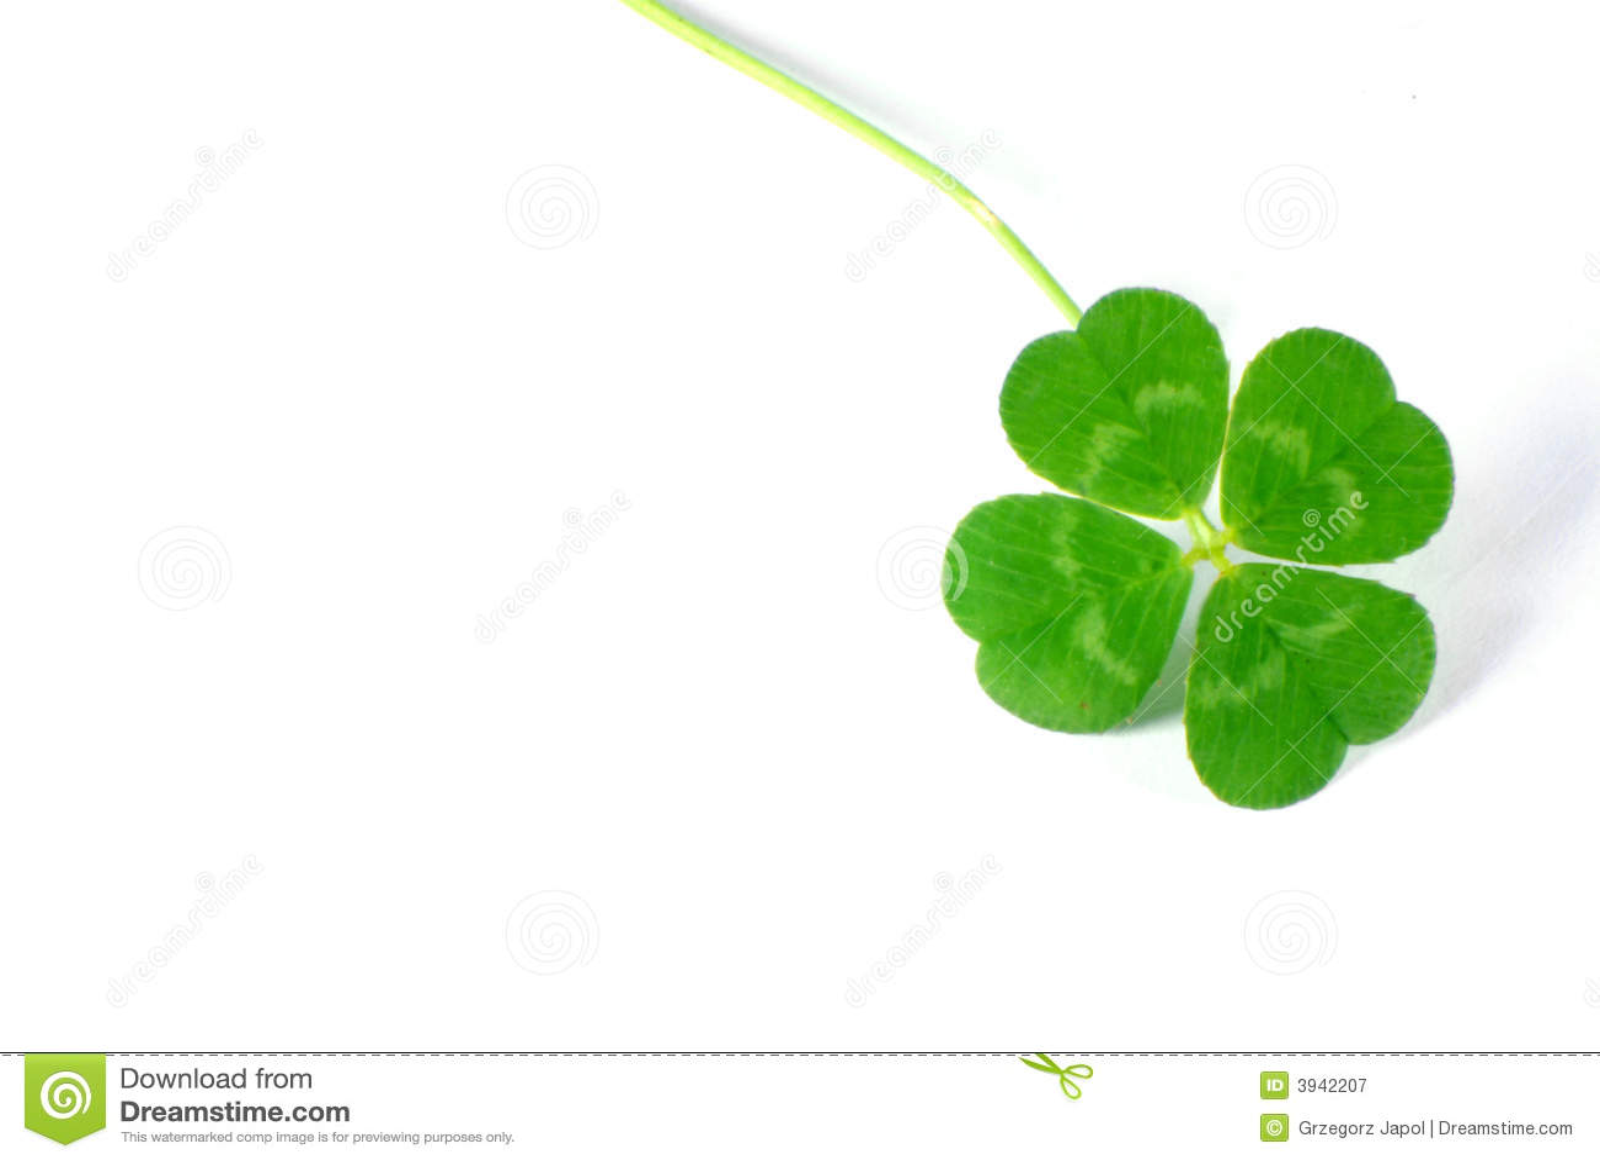 clipart 4 leaf clover